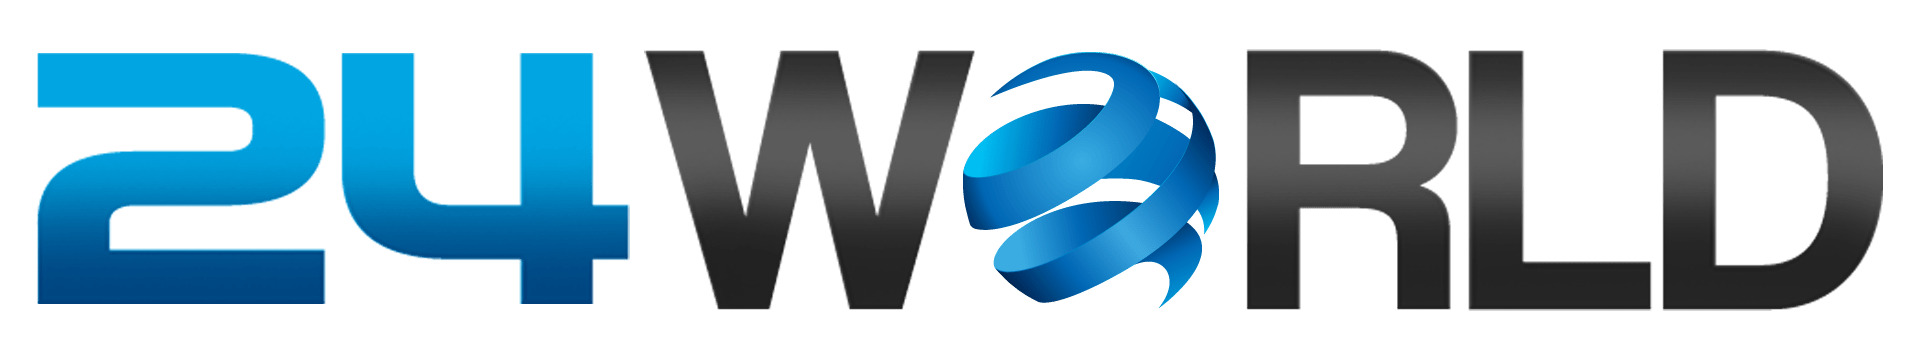 PNG image of 24 World logo